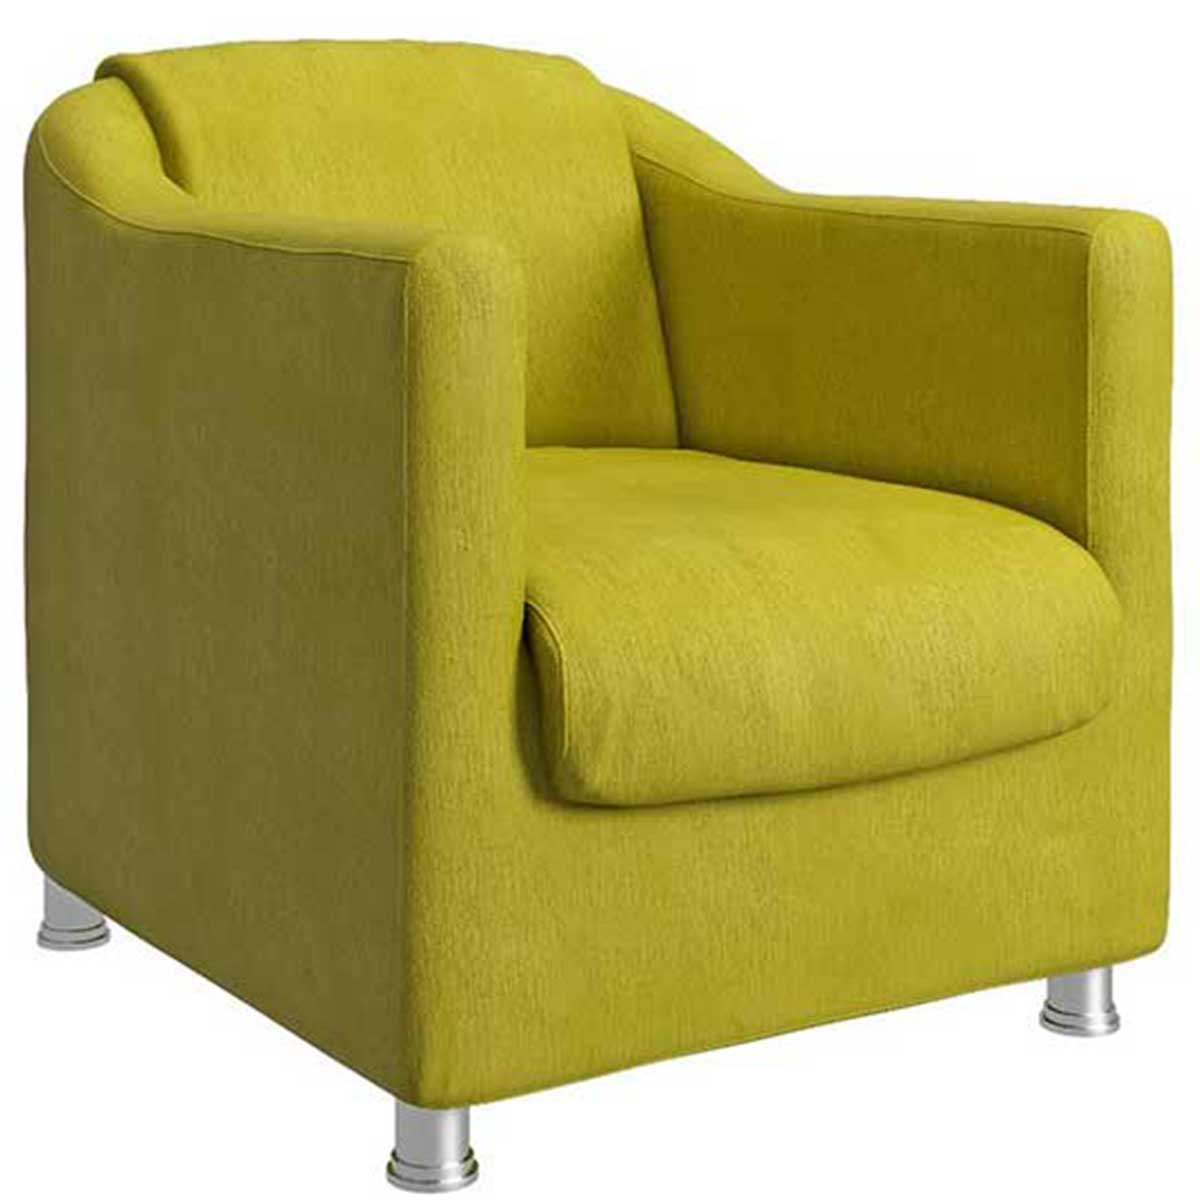 Kit 2 Poltronas Decorativas Luiza Animale Amarelo